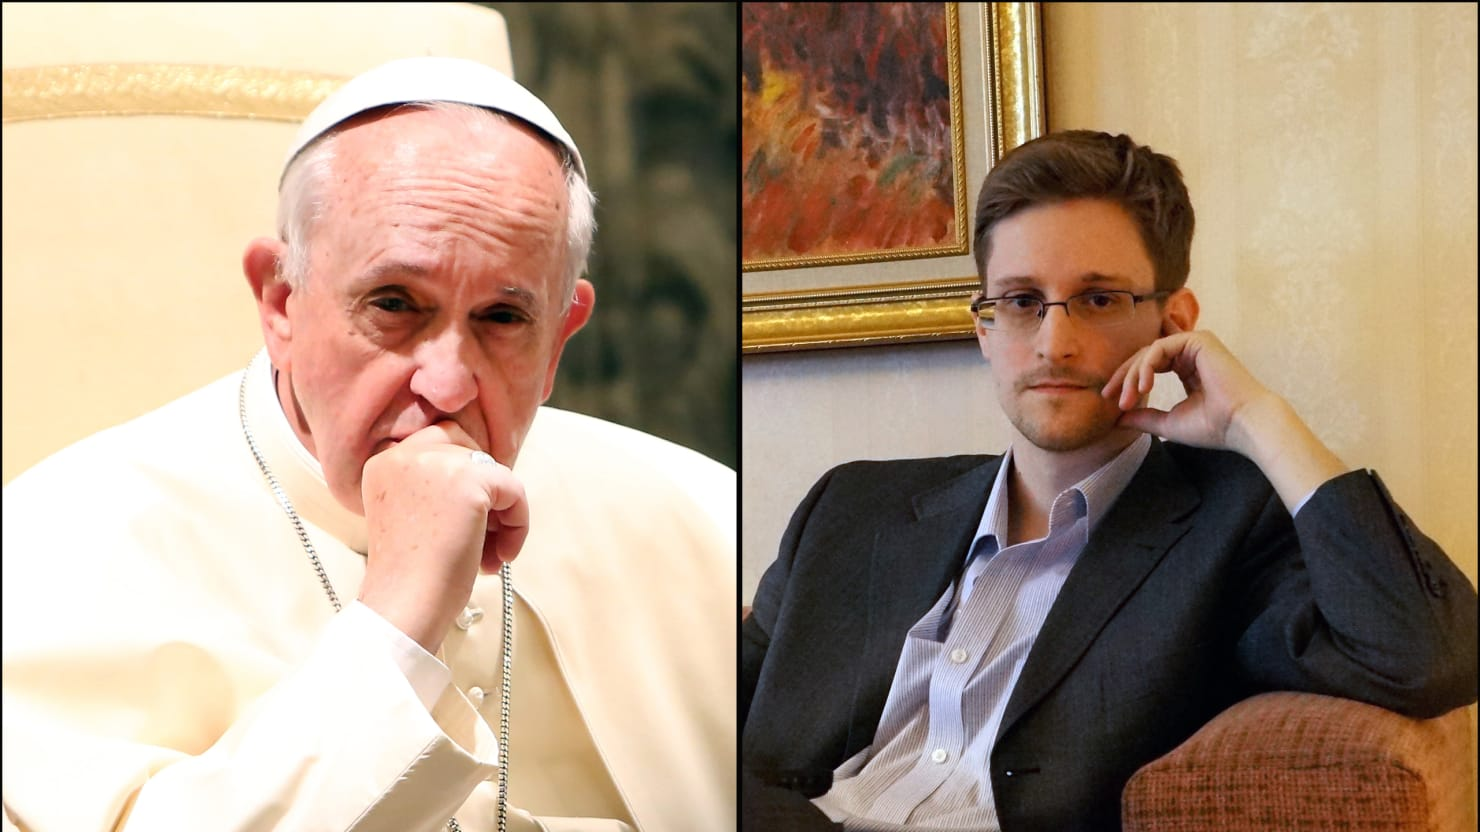 Edward Snowden and Pope Francis Broke America's Political Deadlock in 2013